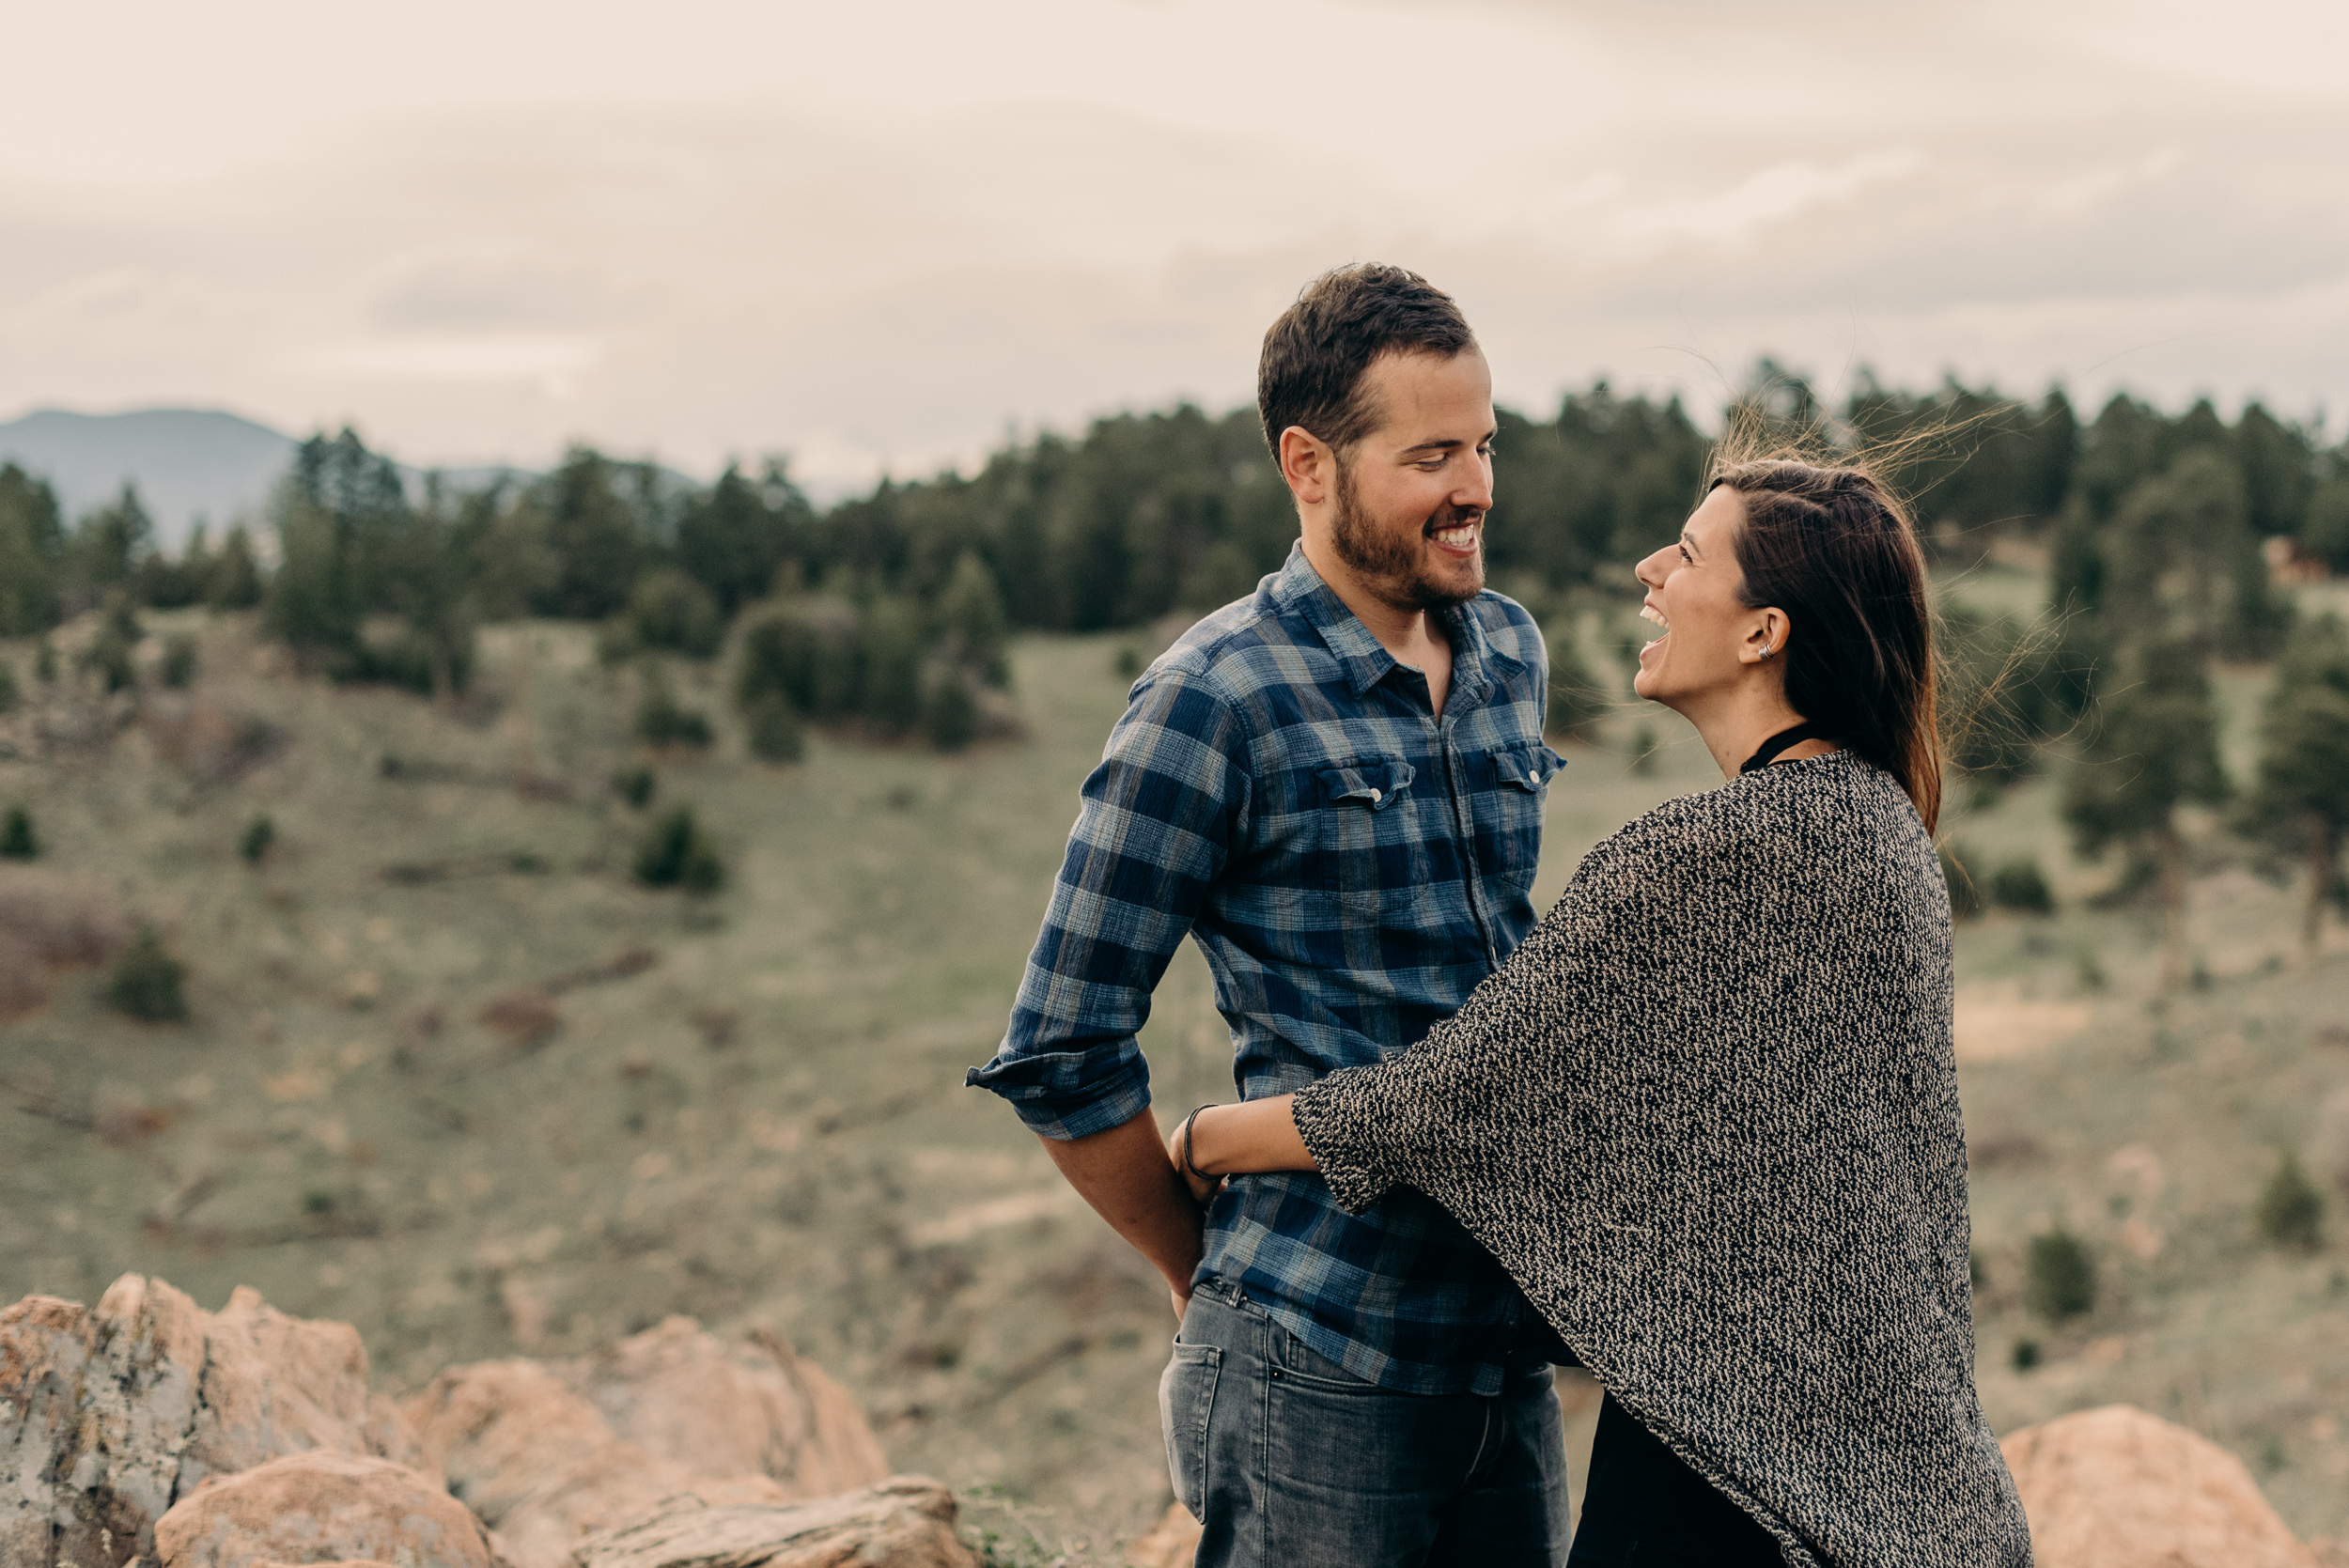 Denver-Colorado-Mt-Falcon-Engagement-Megan-Graham-Photography-6794.jpg